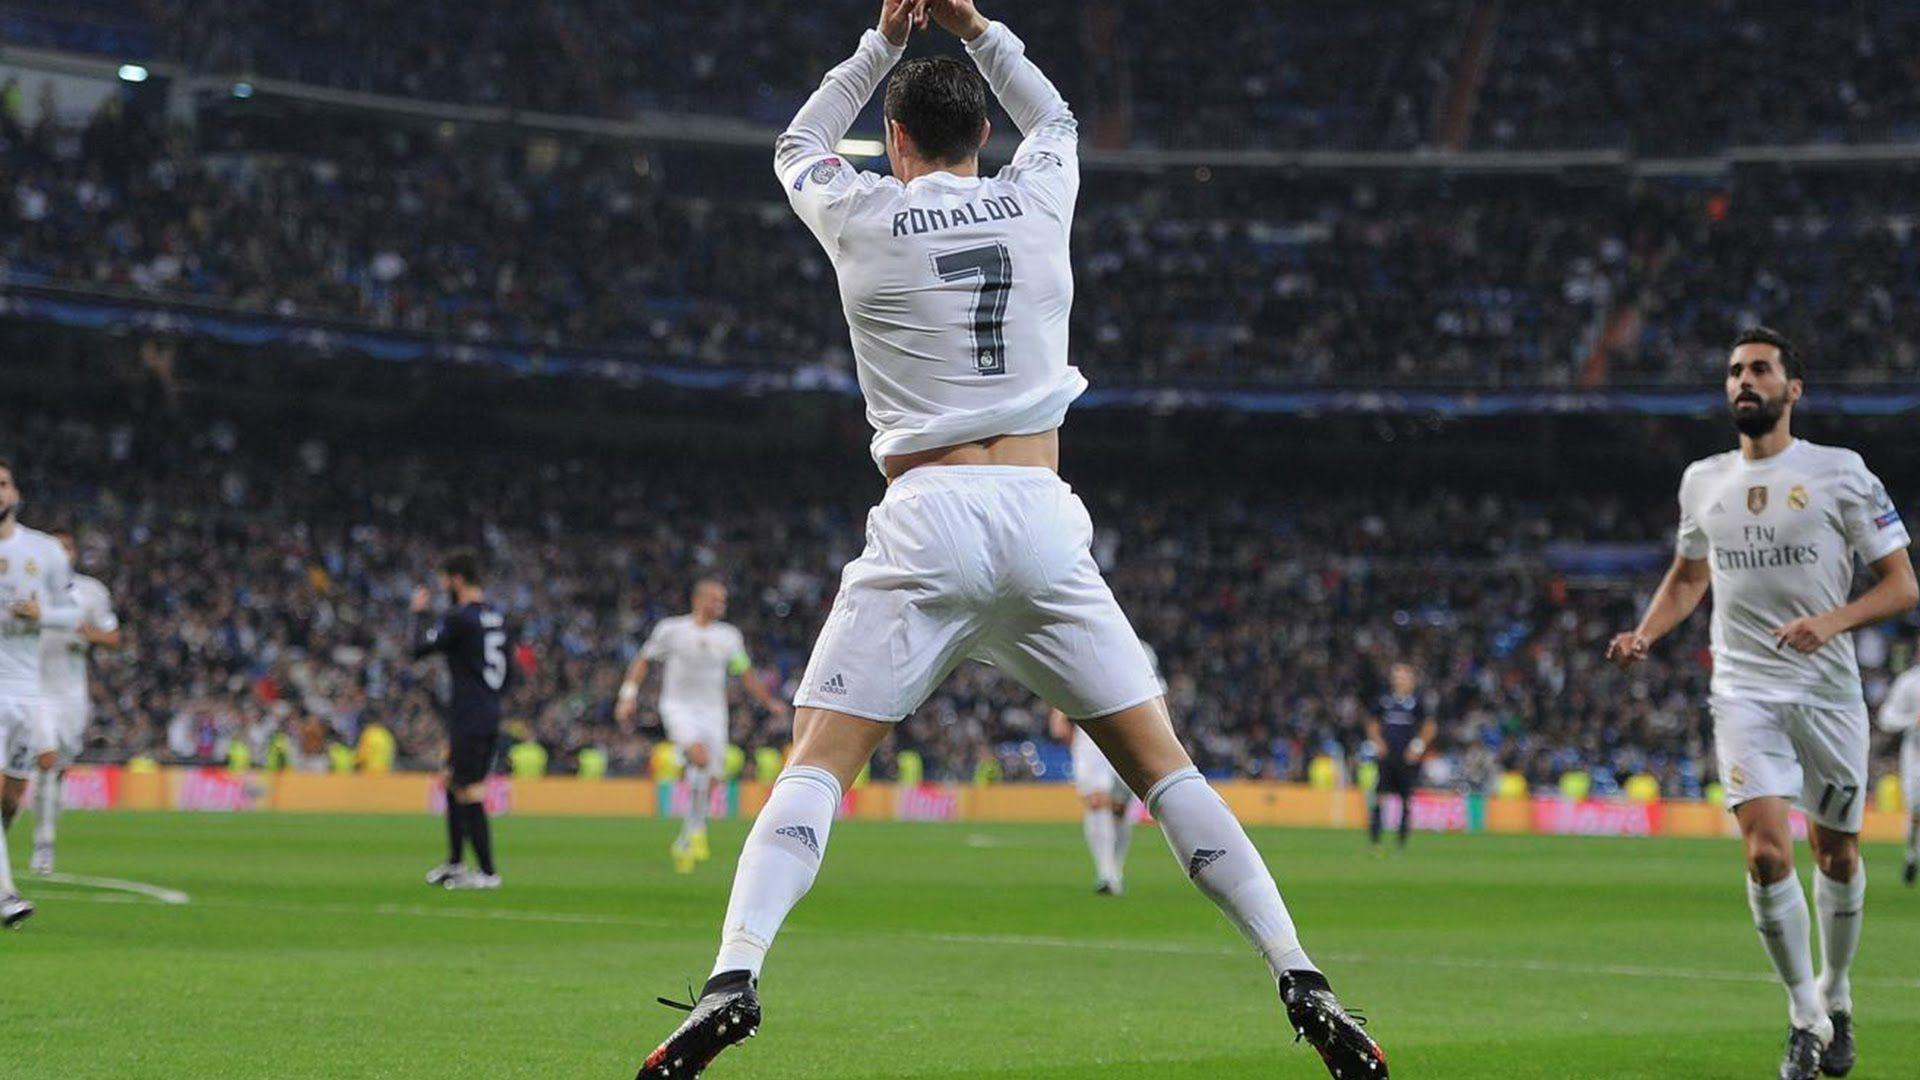 Jumping Celebration Cristiano Ronaldo Real Madrid 2014: Cristiano Ronaldo Celebration Wallpapers